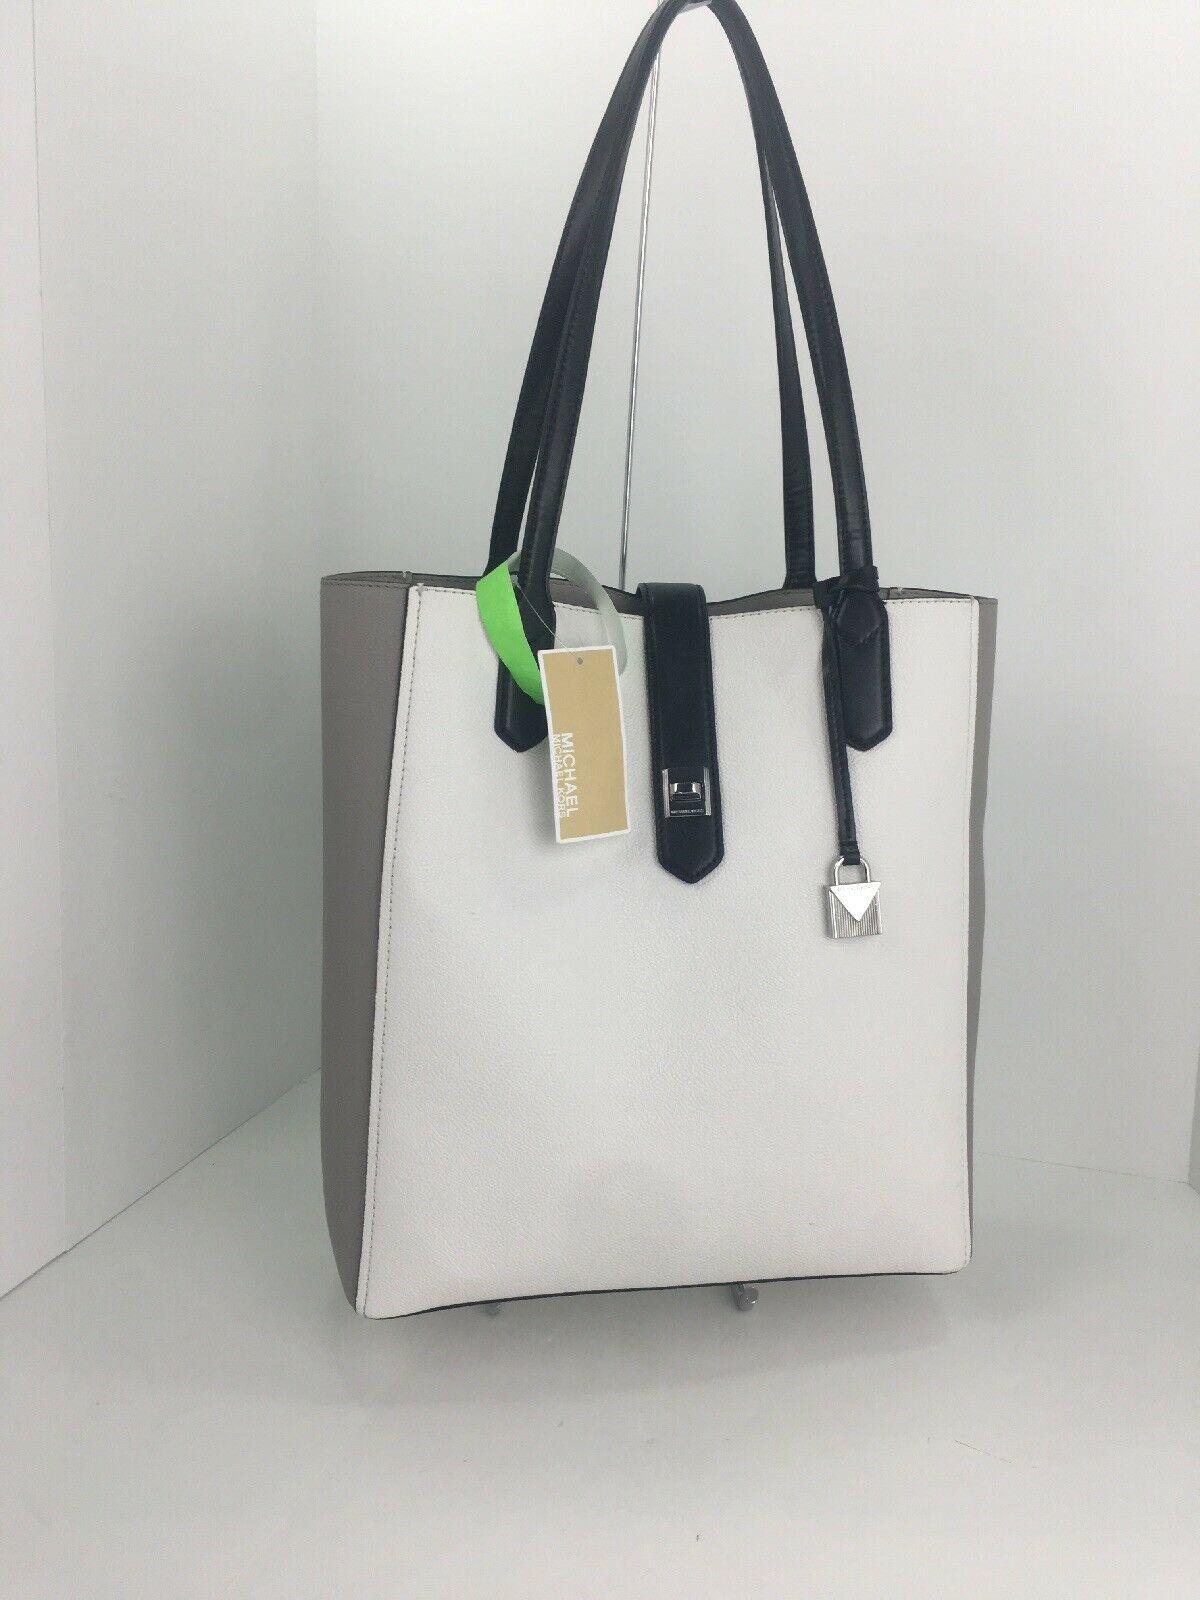 Michael Kors Bag Cassie Tote Medium NS Tote Leather White Gray Black B2R image 5